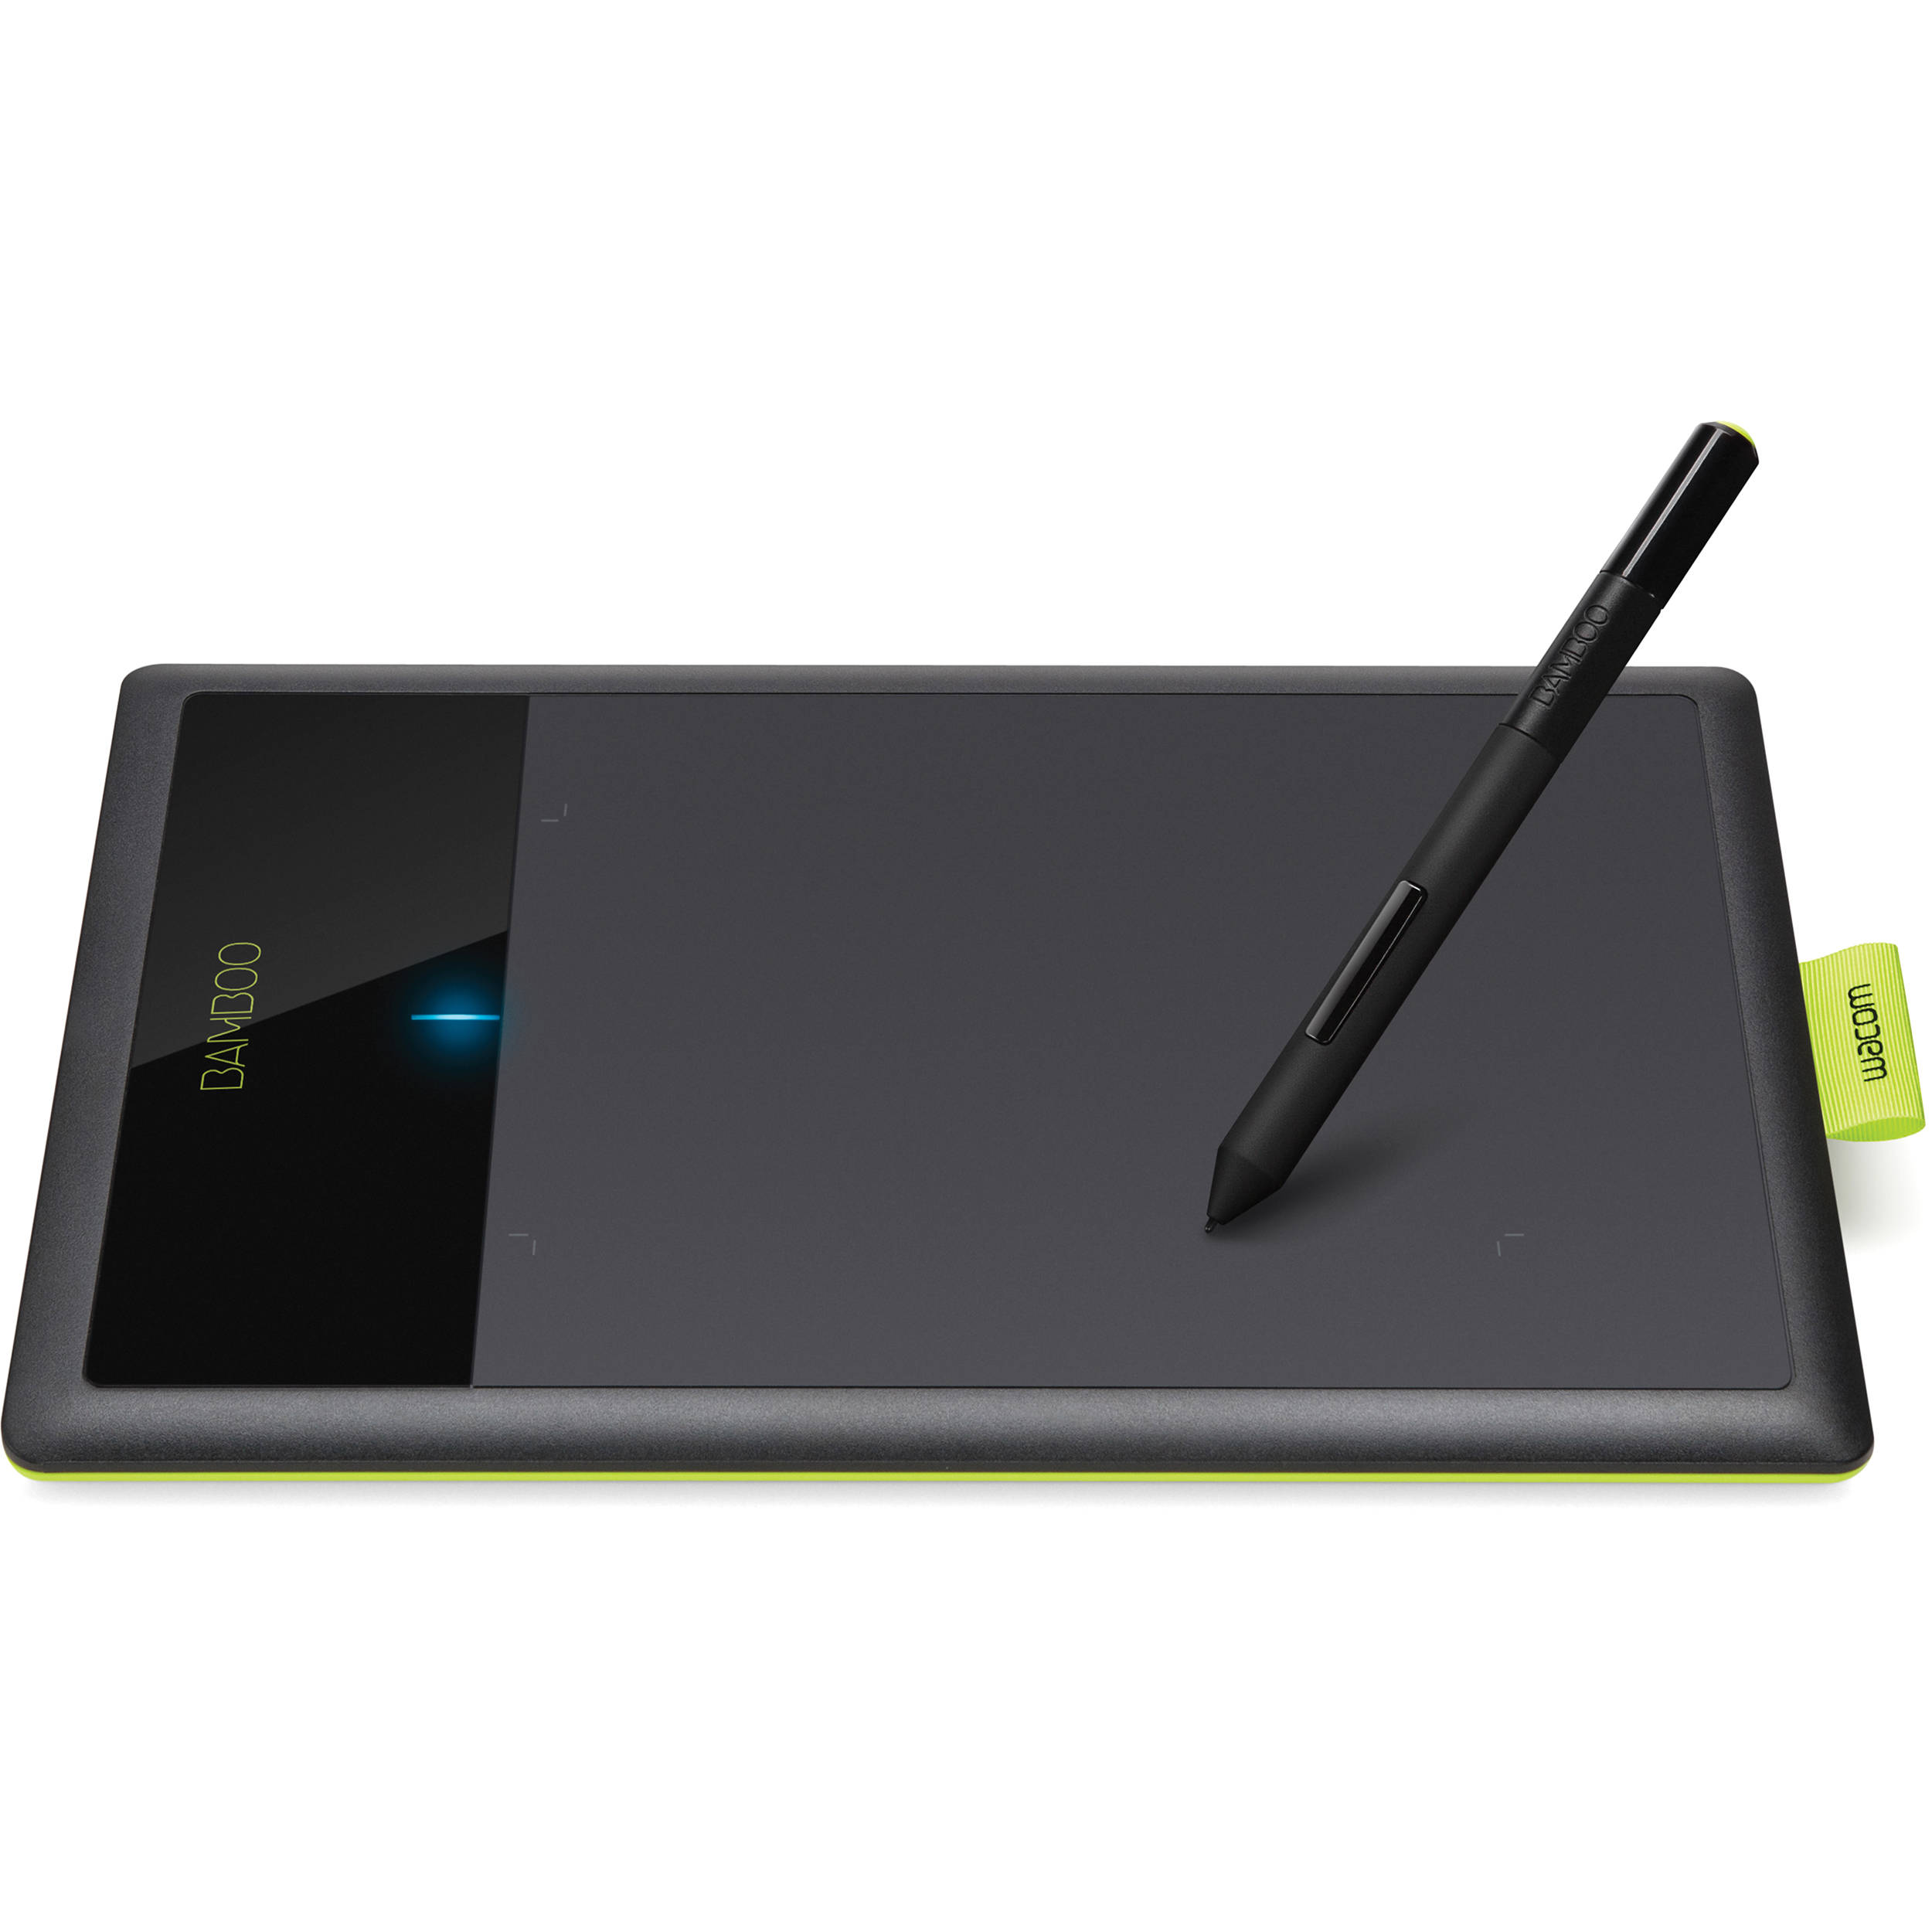 Wacom bamboo connect digital tablet black green ctl470 b amp h